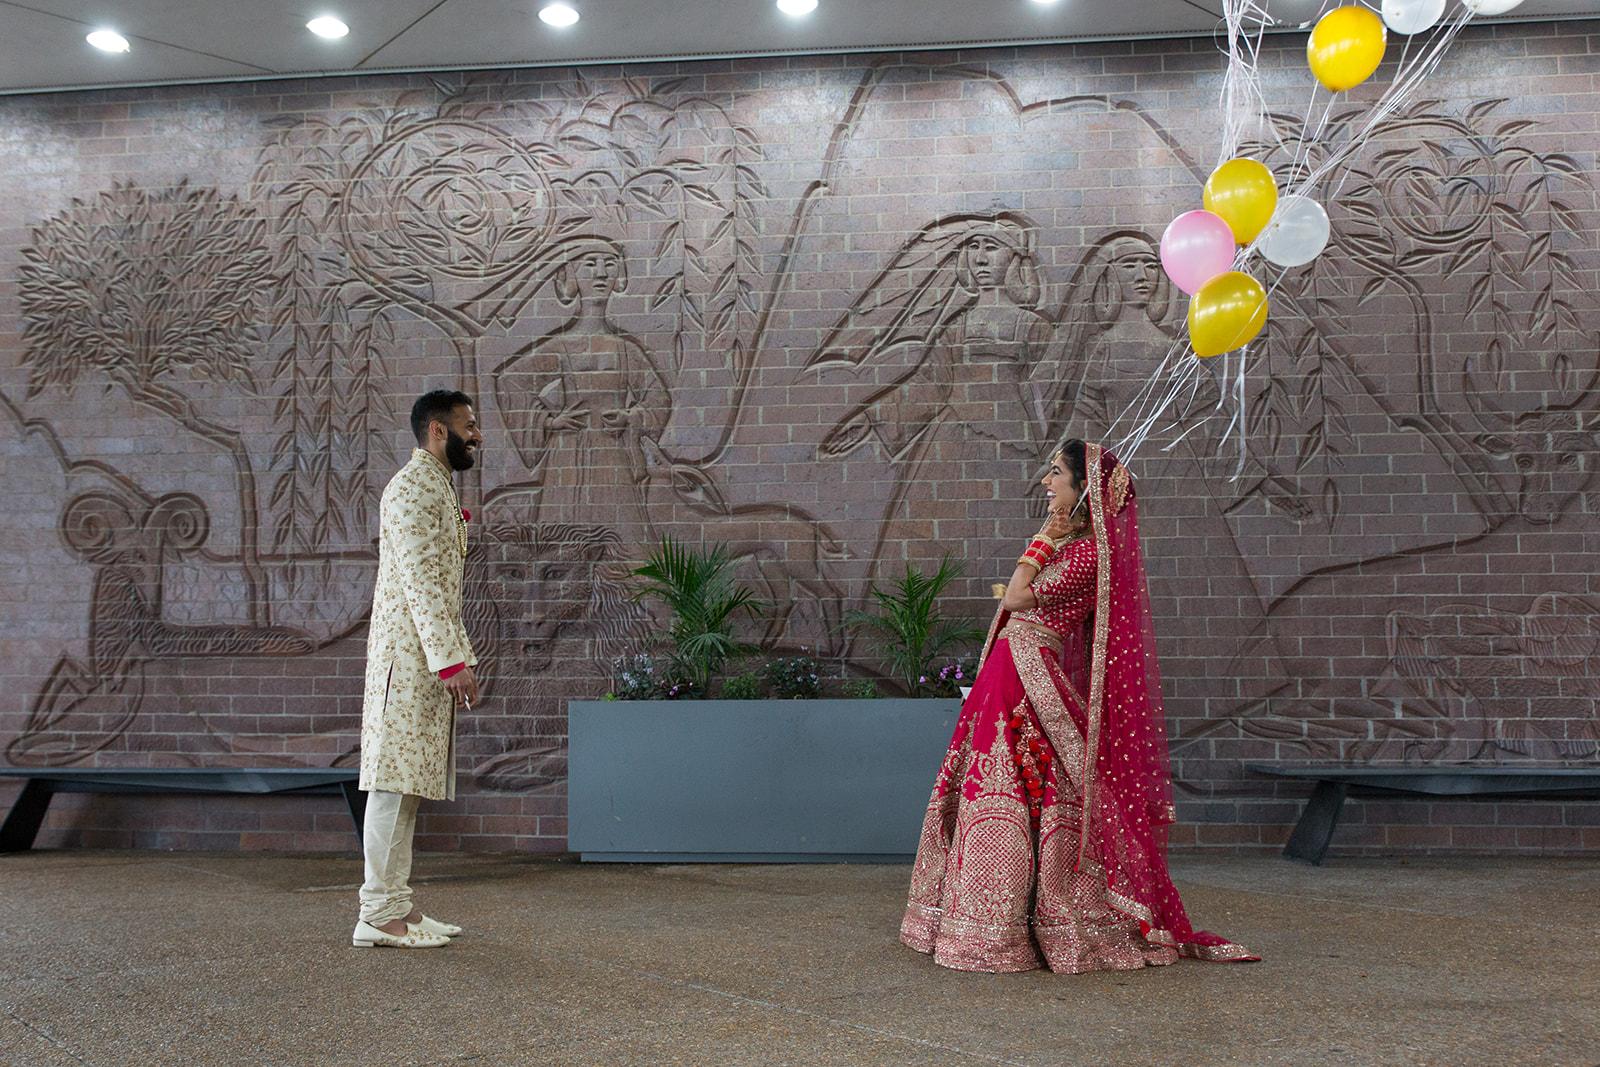 Le Cape Weddings - South Asian Wedding Sumeet and Chhavi - First Look S-3.jpg